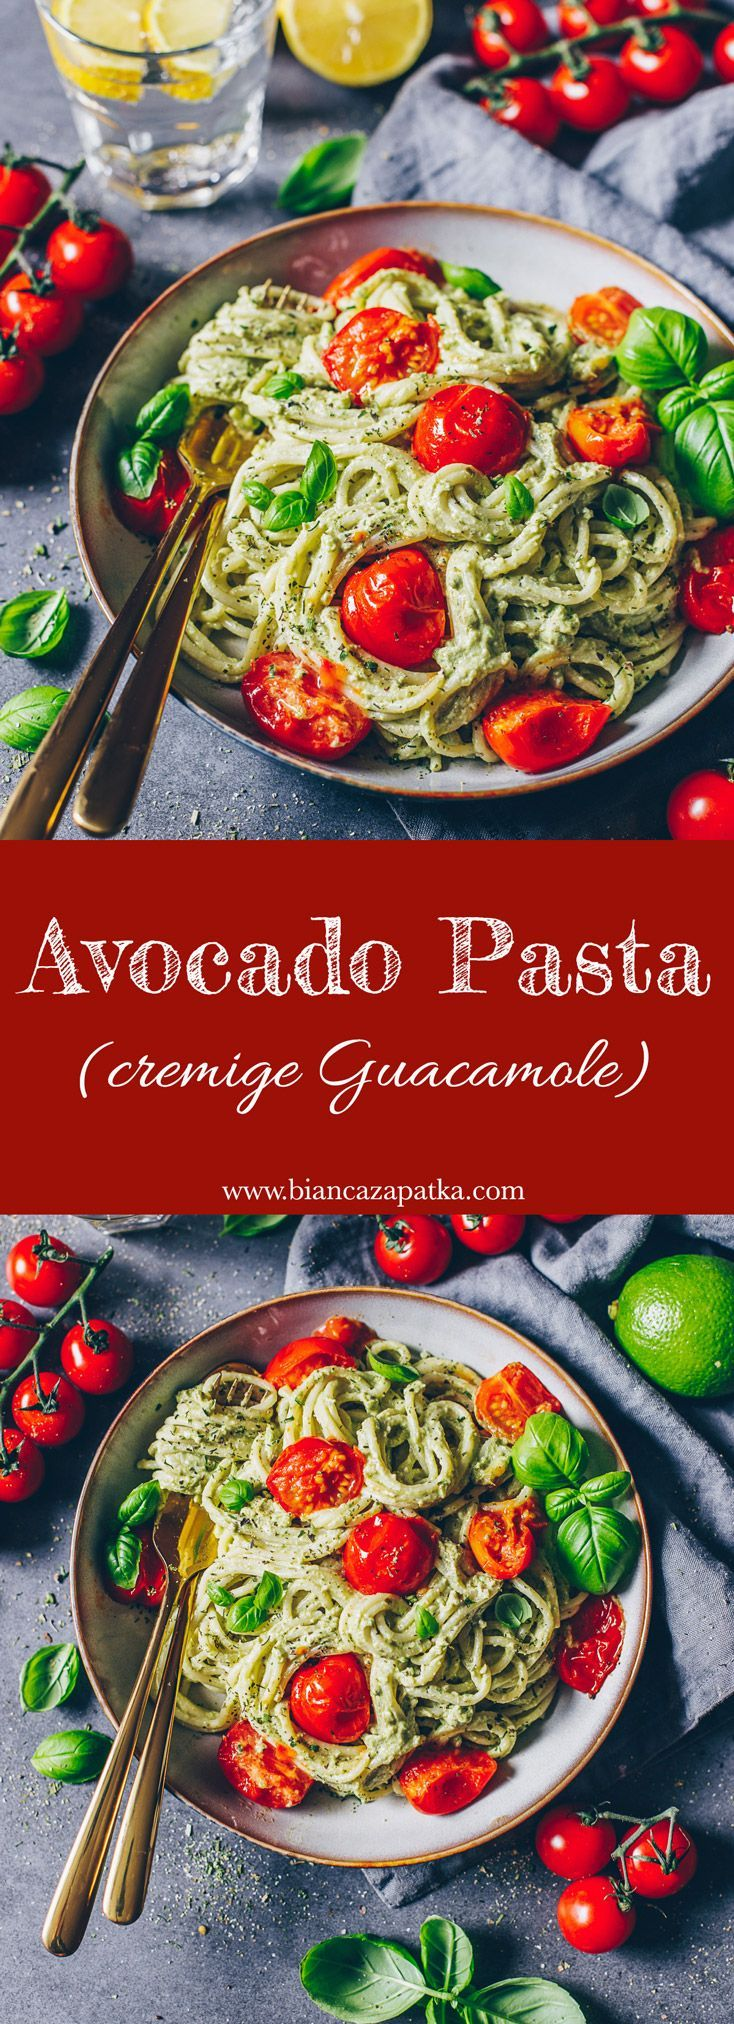 Avocado Pasta (cremige Guacamole) - Bianca Zapatka | Rezepte Avocado Pasta (cremige Guacamole) - Bi